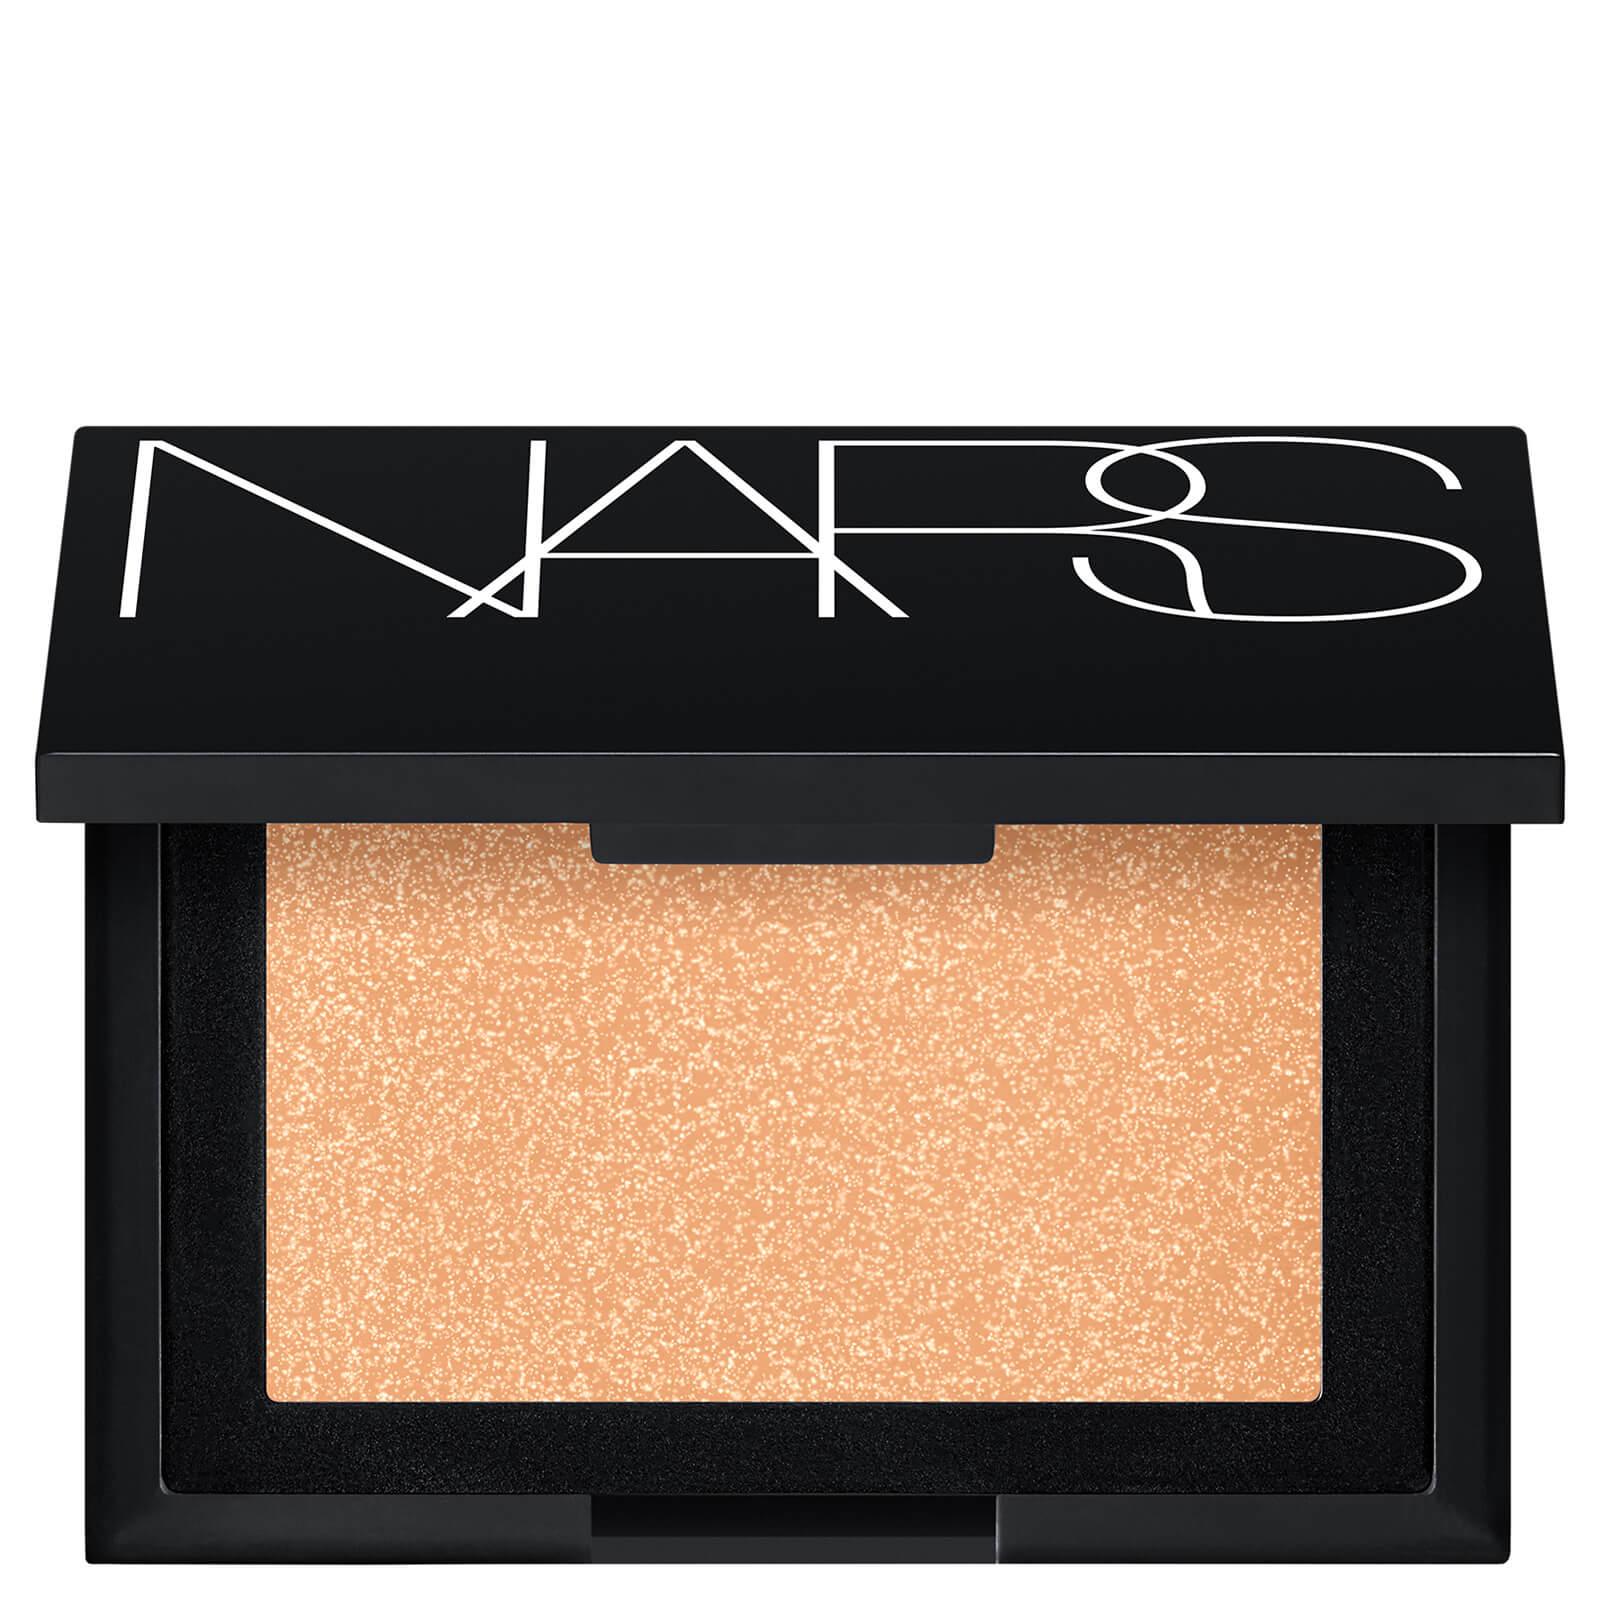 NARS Cosmetics Light Sculpting Highlighting Powder 8g (Various Shades) - Ibiza